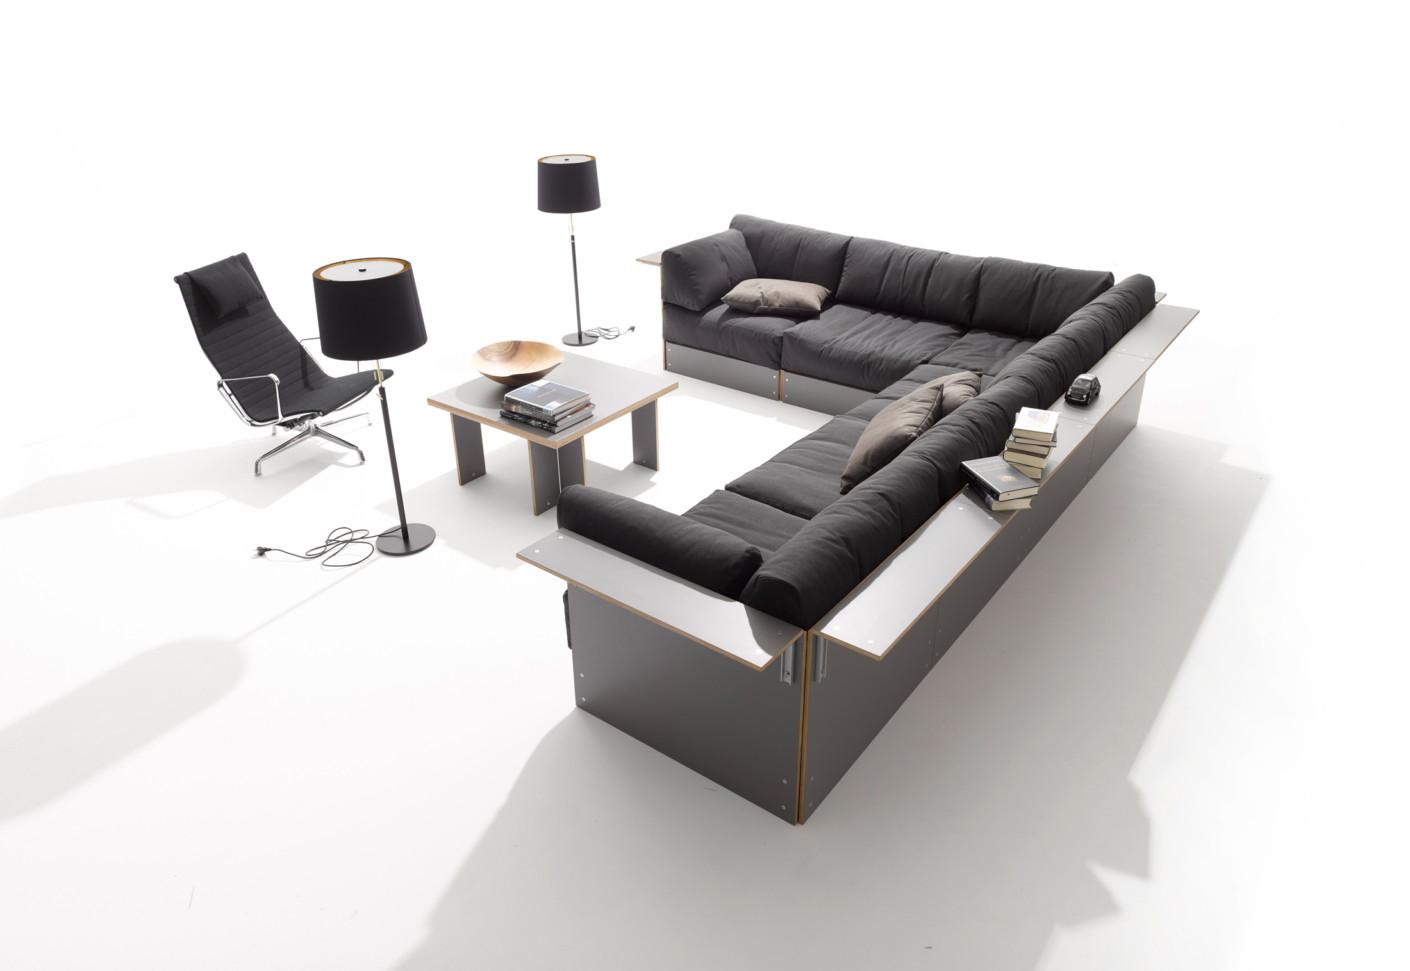 rolf heide coffee table by m ller m belwerkst tten stylepark. Black Bedroom Furniture Sets. Home Design Ideas